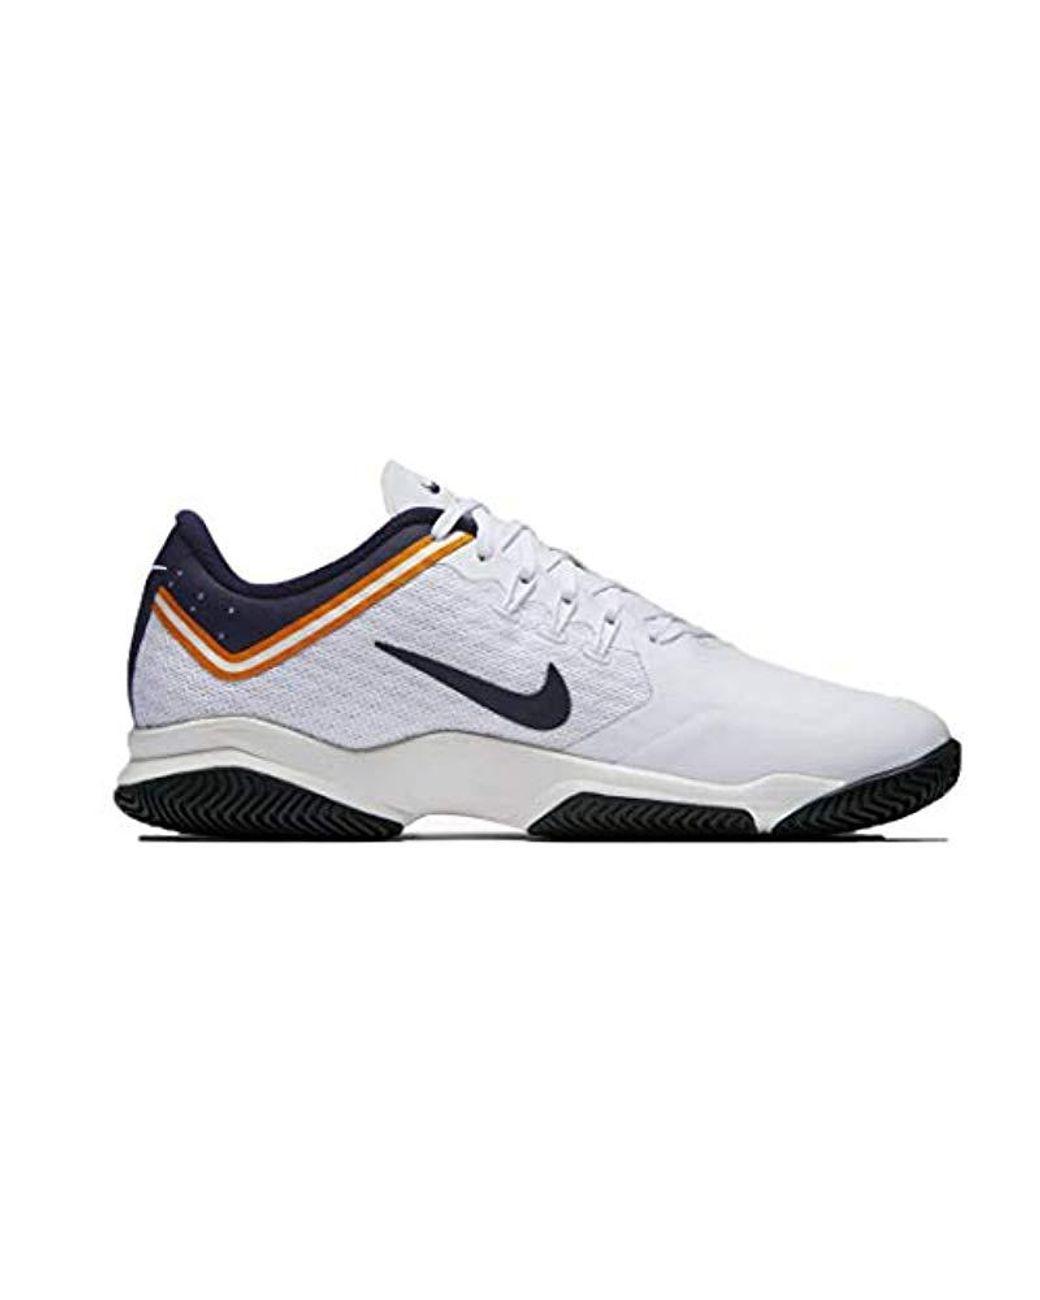 Nike 's Tennisschuh Air Zoom Ultra Hard Court Tennis Shoes